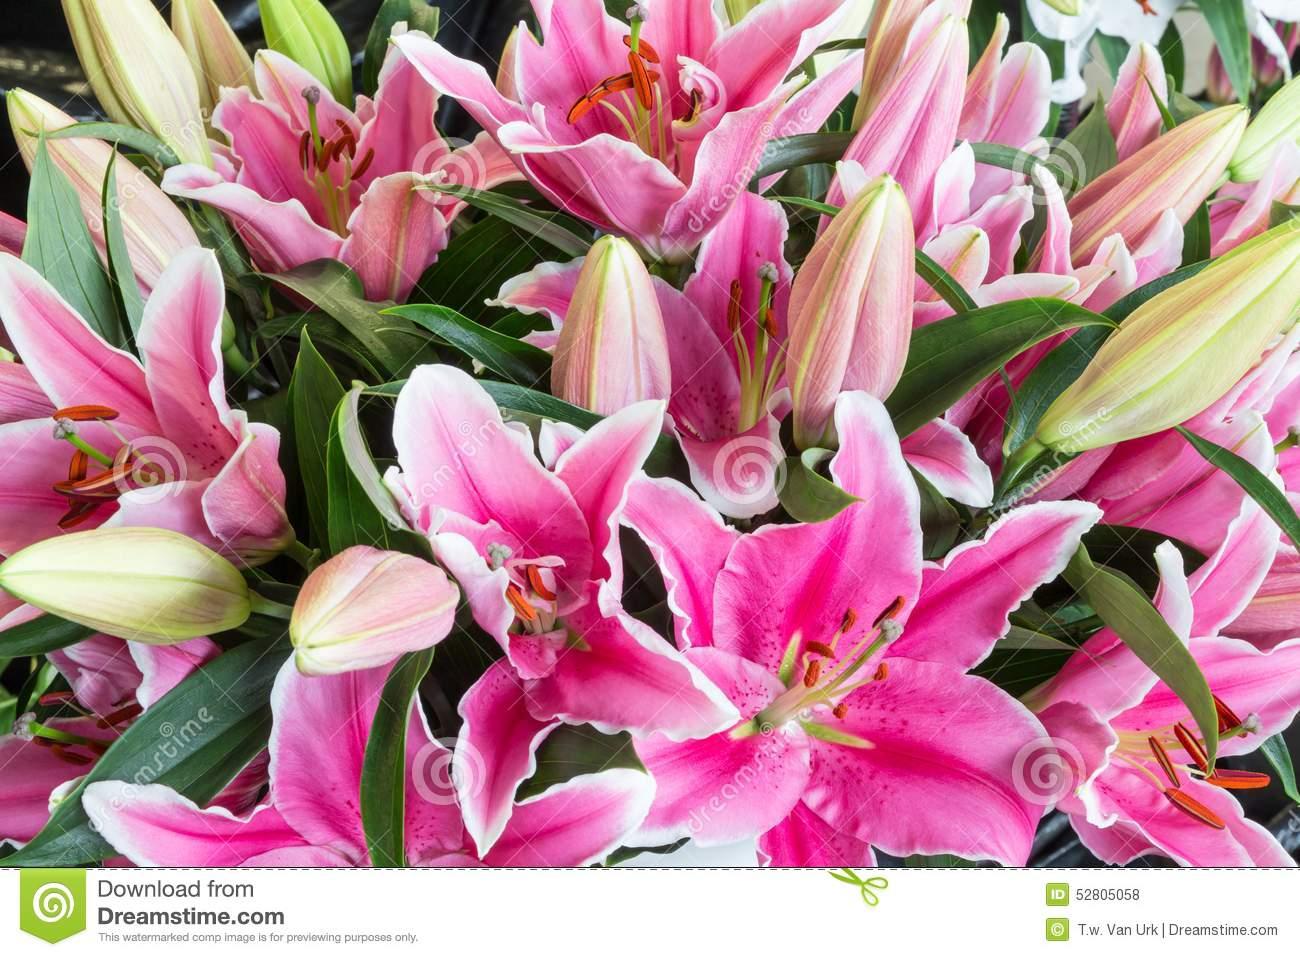 Bush Of Purple Lily Flowers (Lilium) Stock Photo.